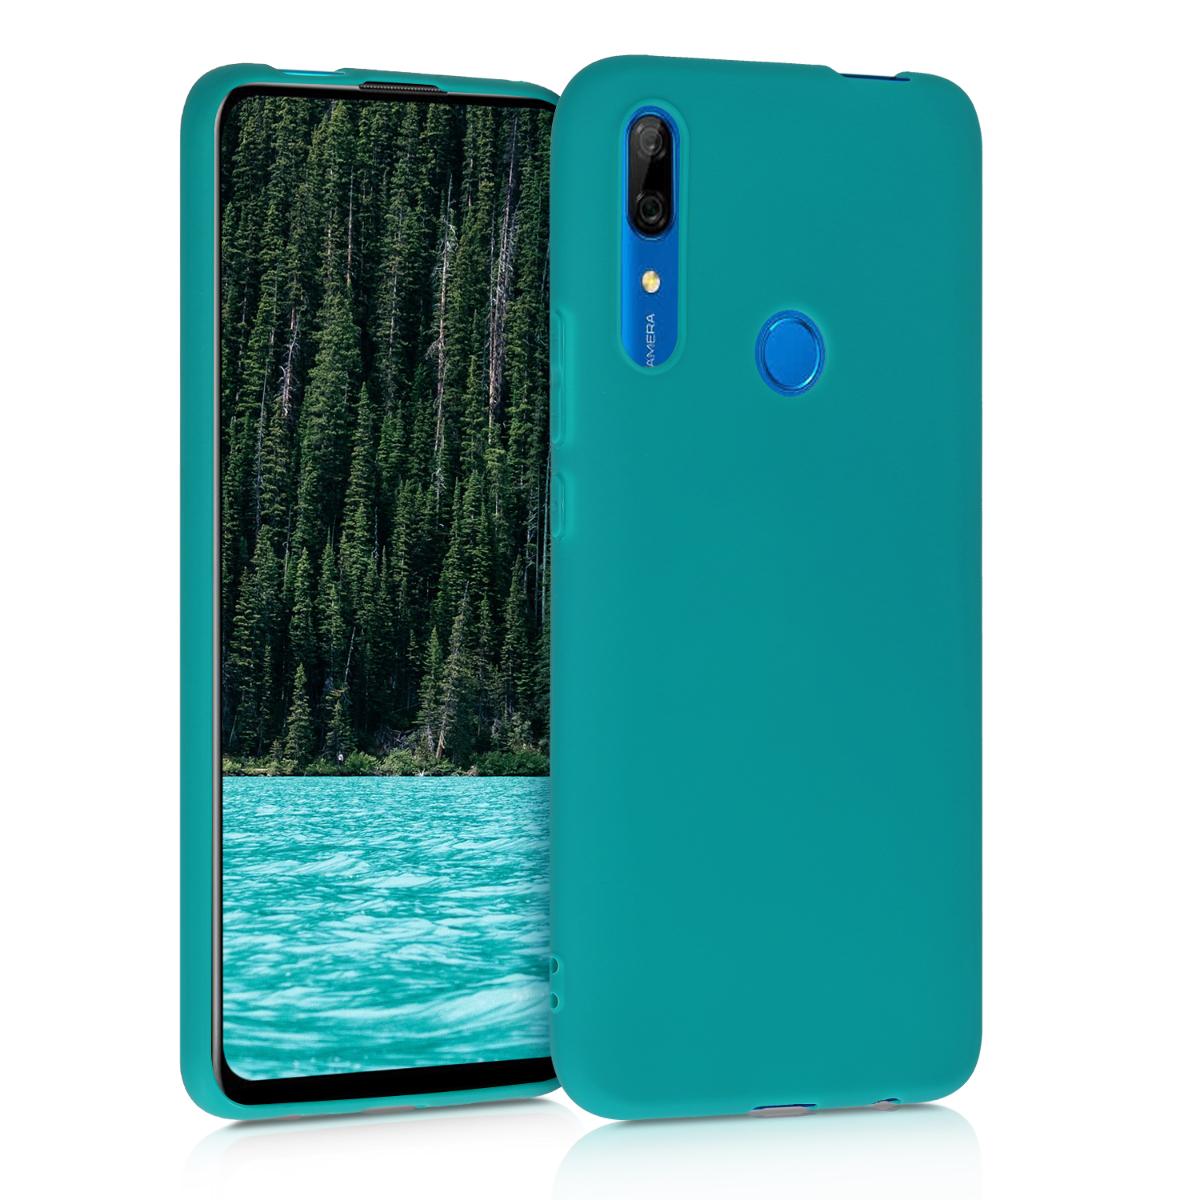 KW Θήκη Σιλικόνης Huawei P Smart Z - Teal Matte (49449.57)